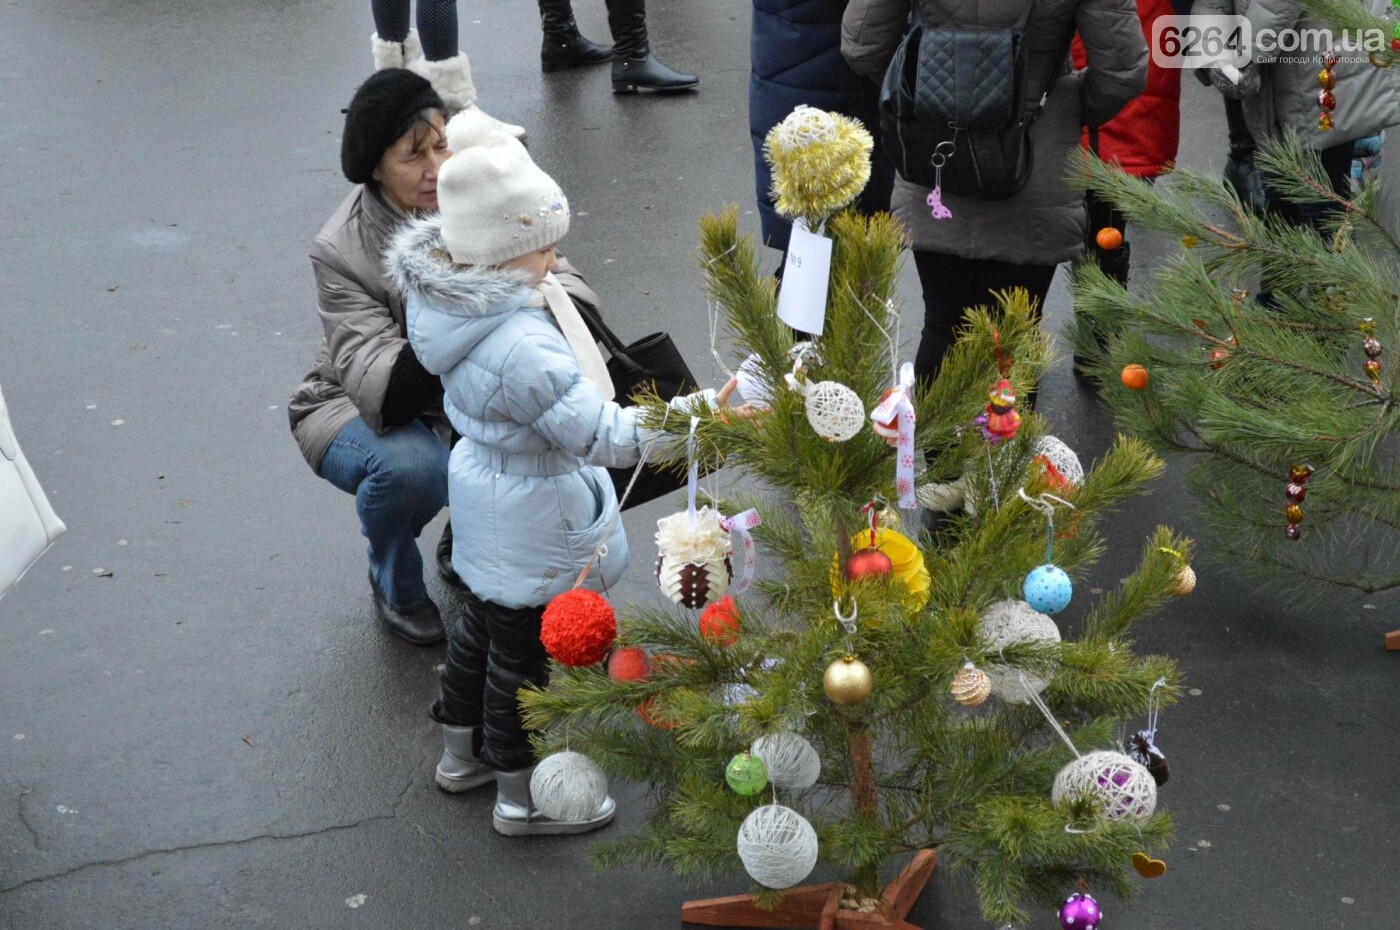 В Краматорске стартовал парад елок, фото-6